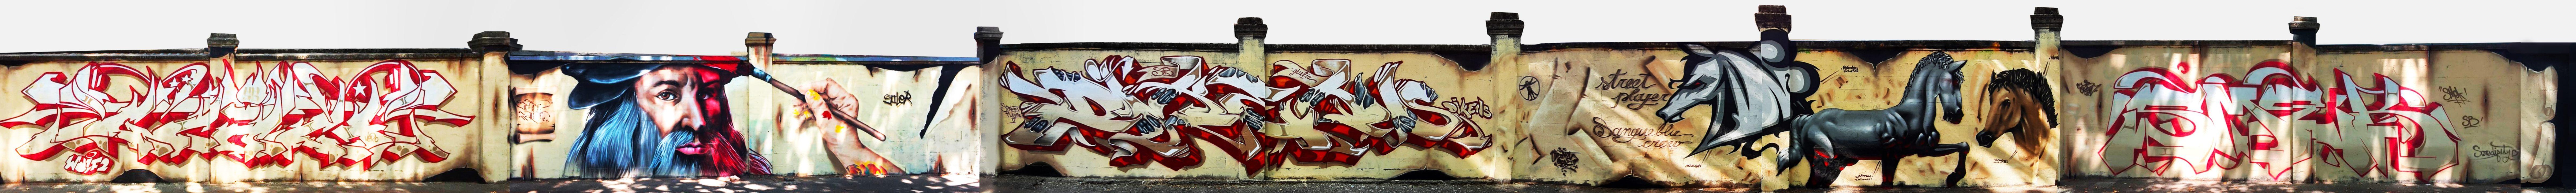 Wolf2 + Siler + Dikens23 + Siret + Smek